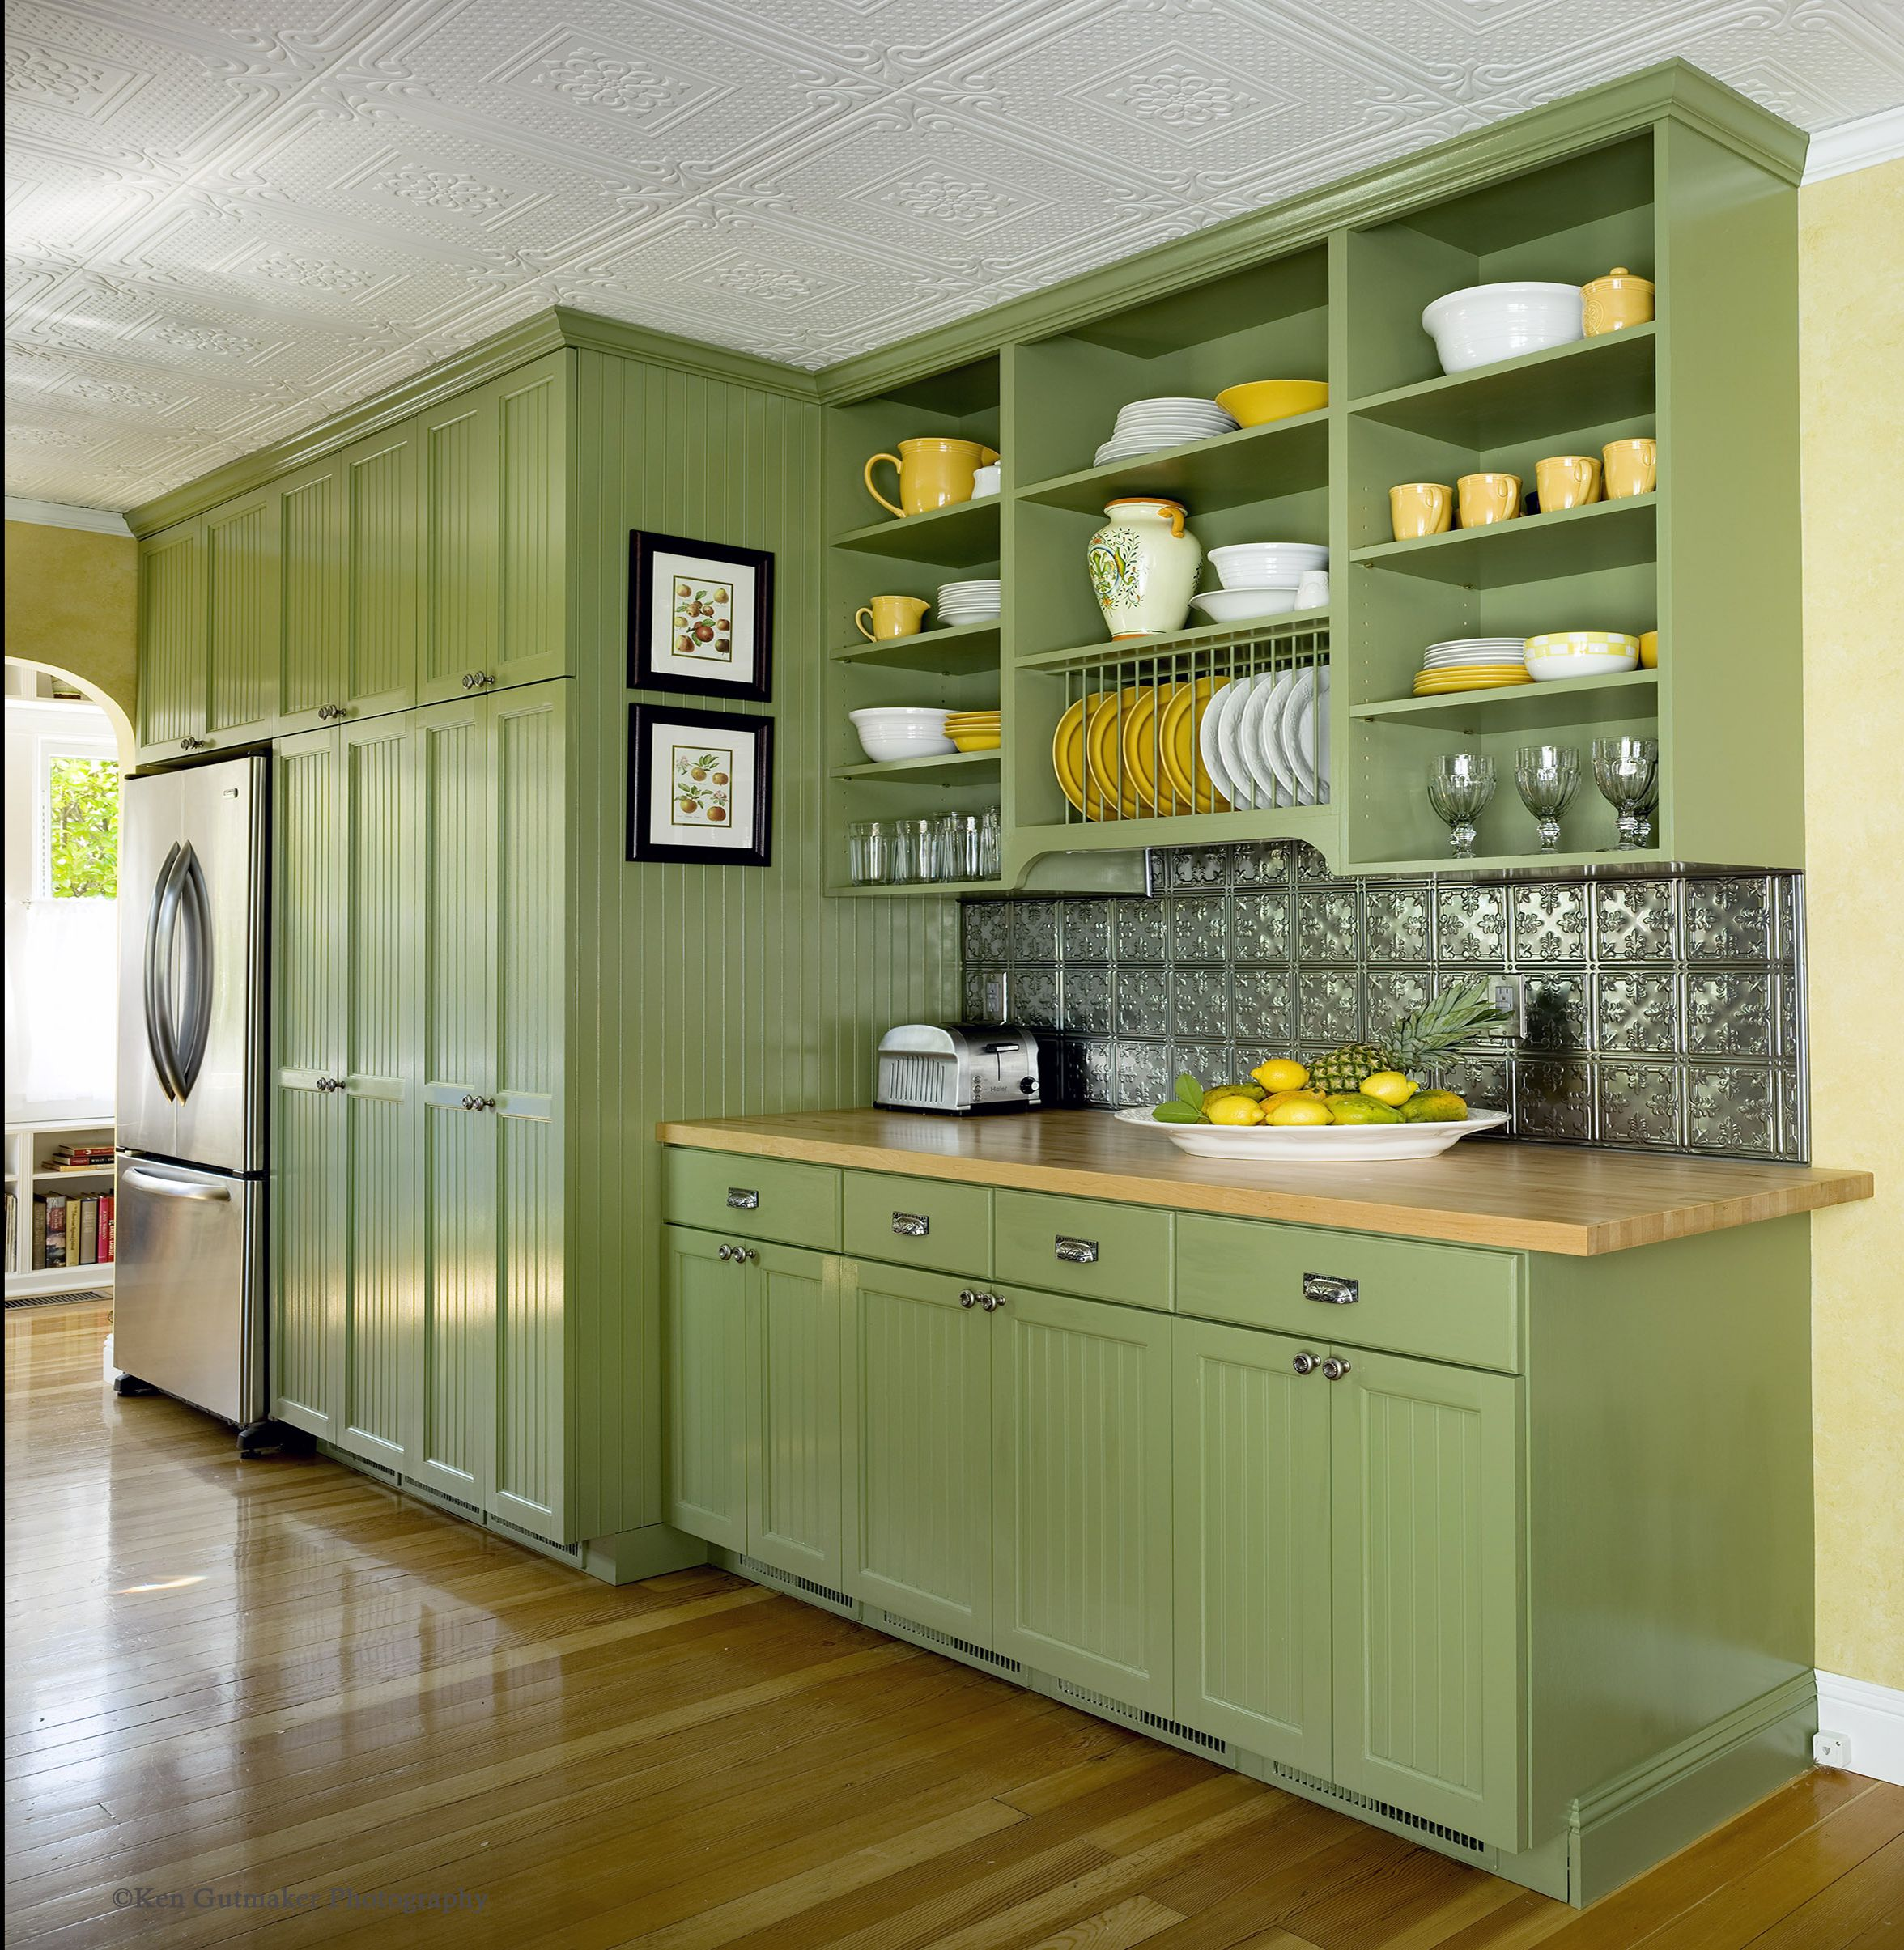 The Seven Sins Of Bathroom Design Green Kitchen Cabinets Light Green Kitchen Kitchen Color Green